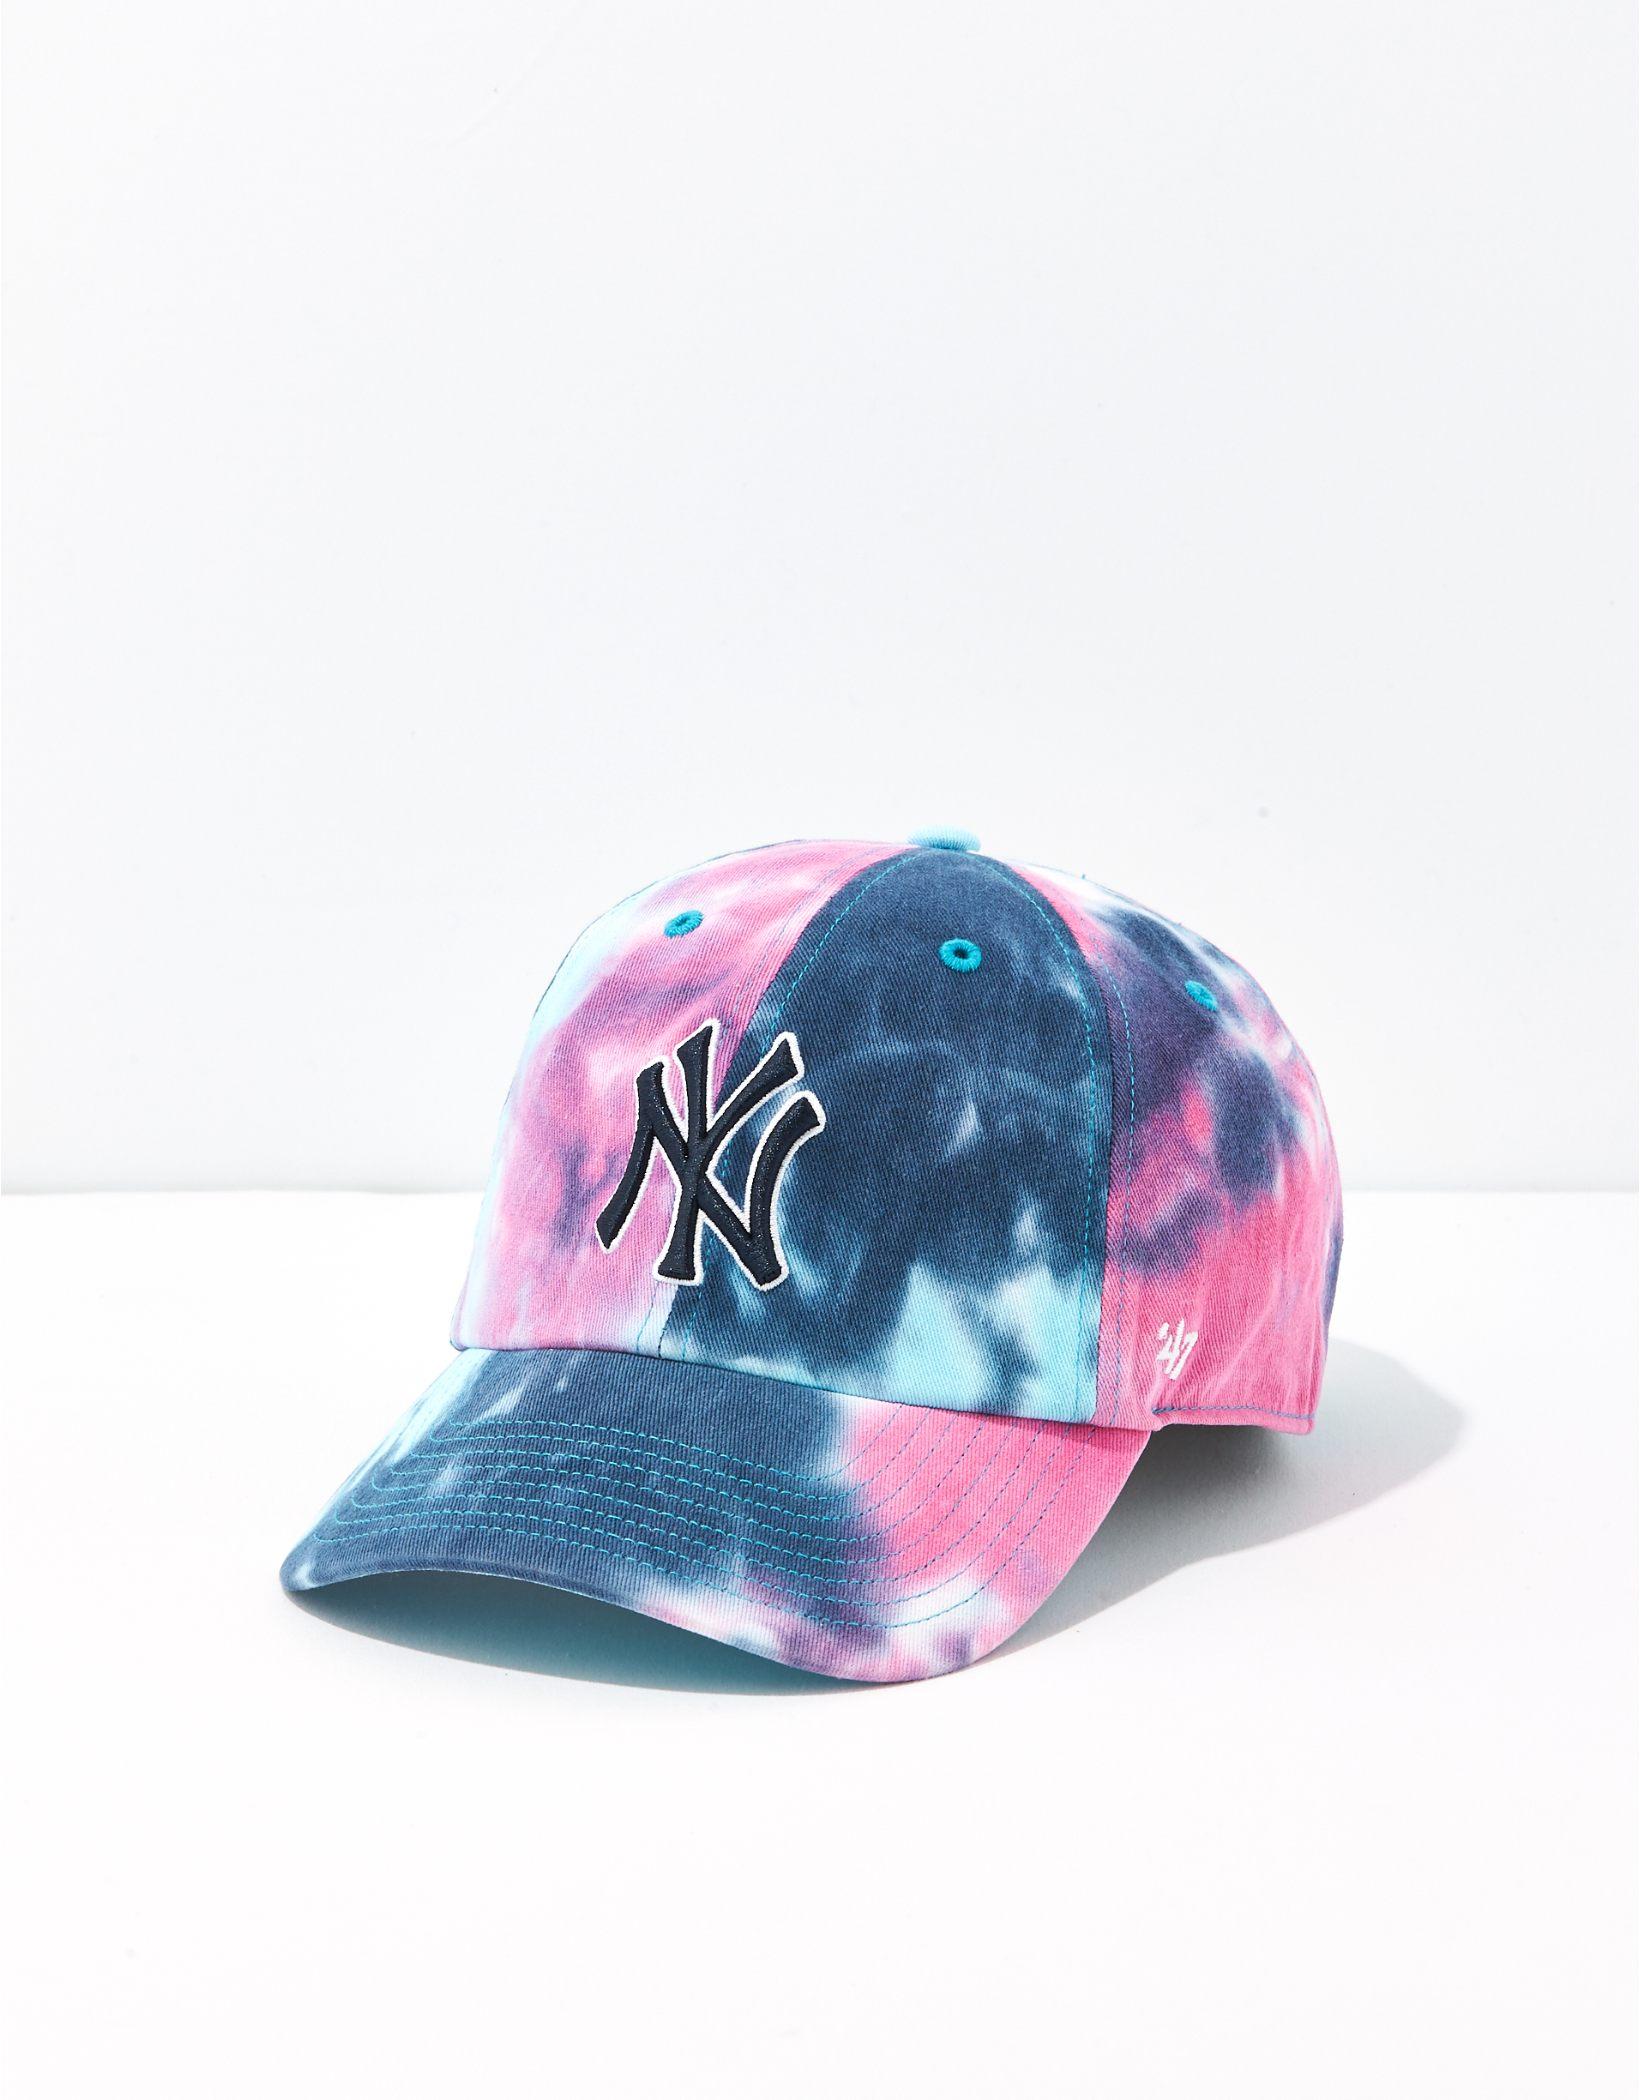 '47 NY Yankees Tie-Dye Baseball Hat